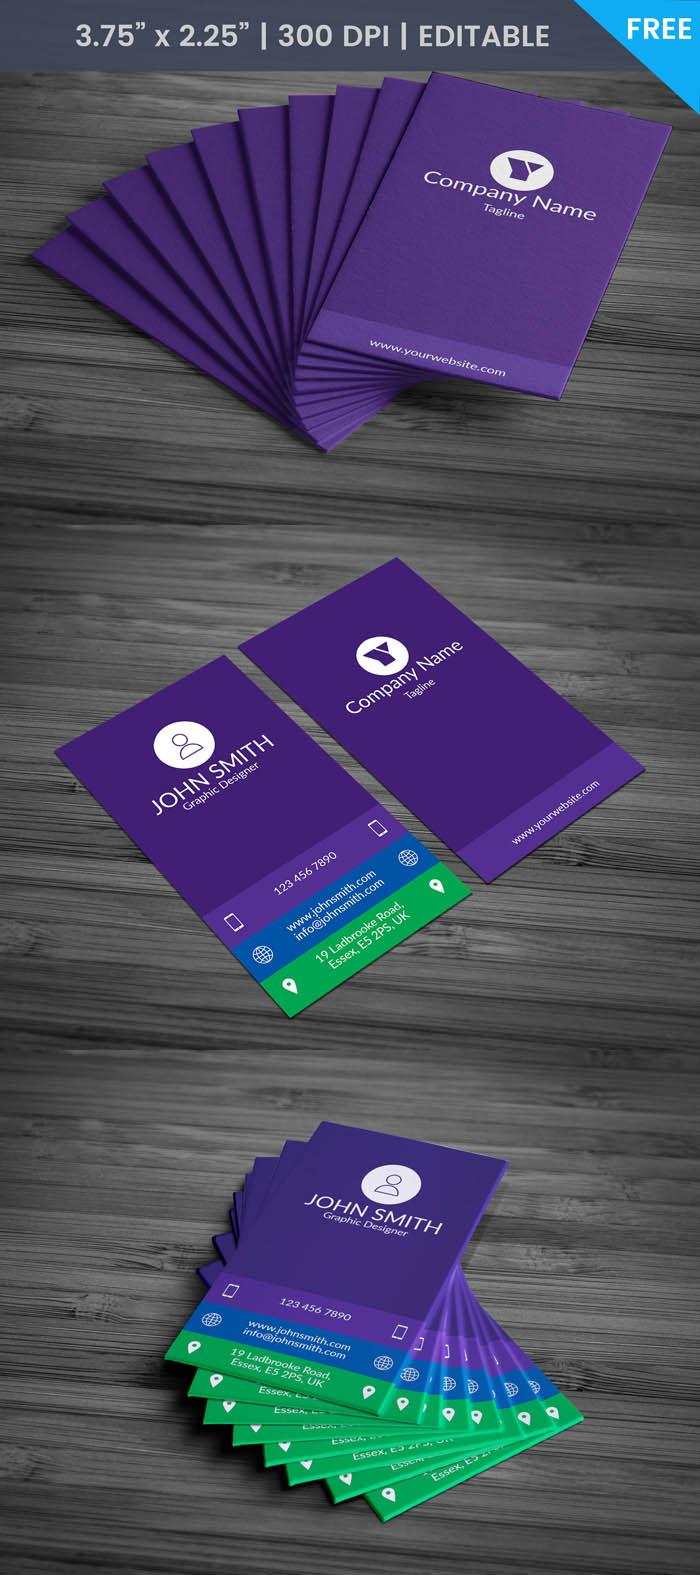 Free Female Developer Business Card Template